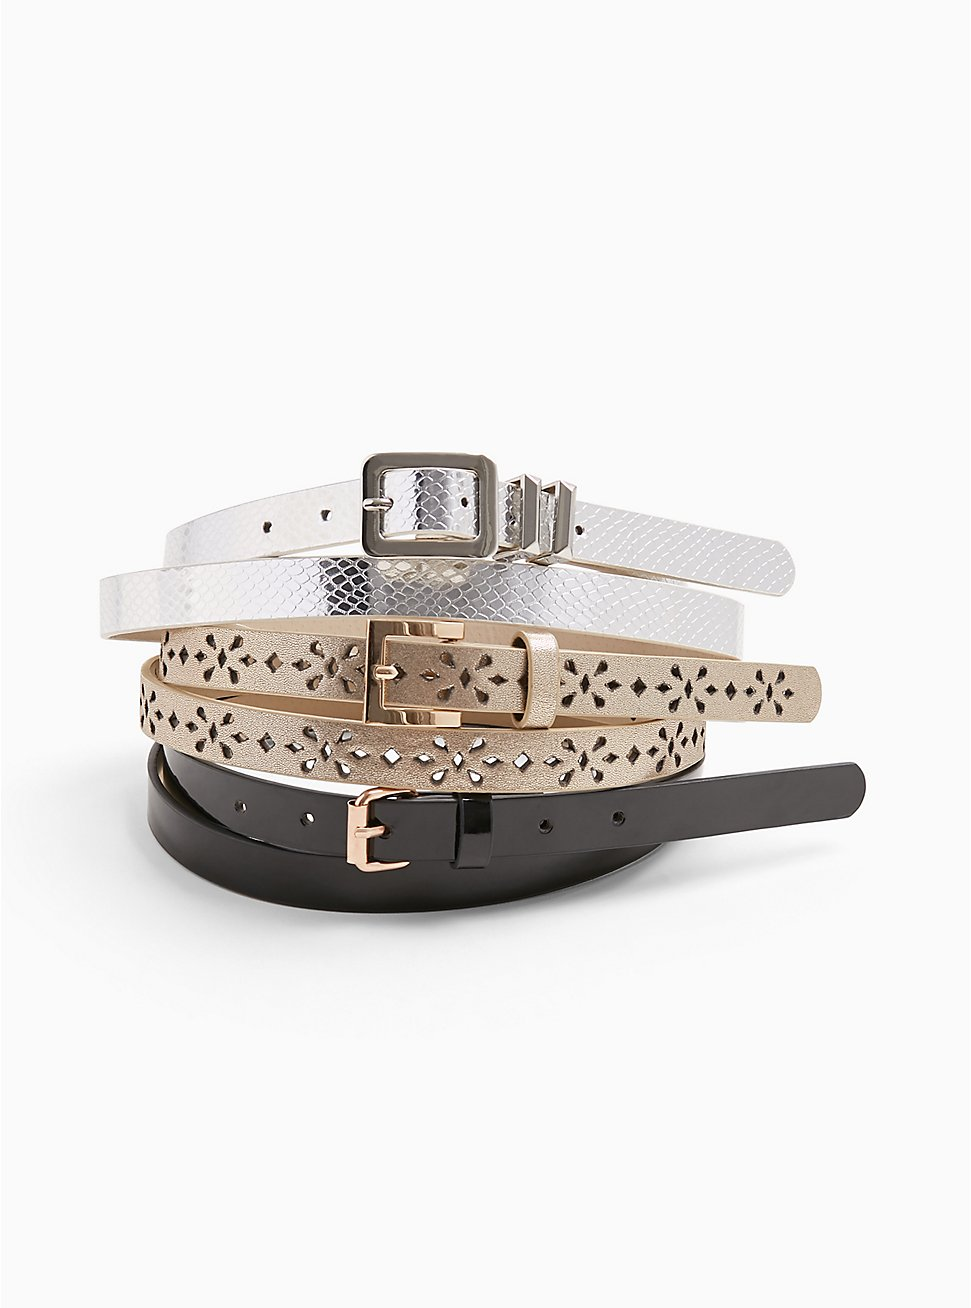 Plus Size Black & Multi Metallic Faux Leather Belt - Pack of 3, MULTI, hi-res